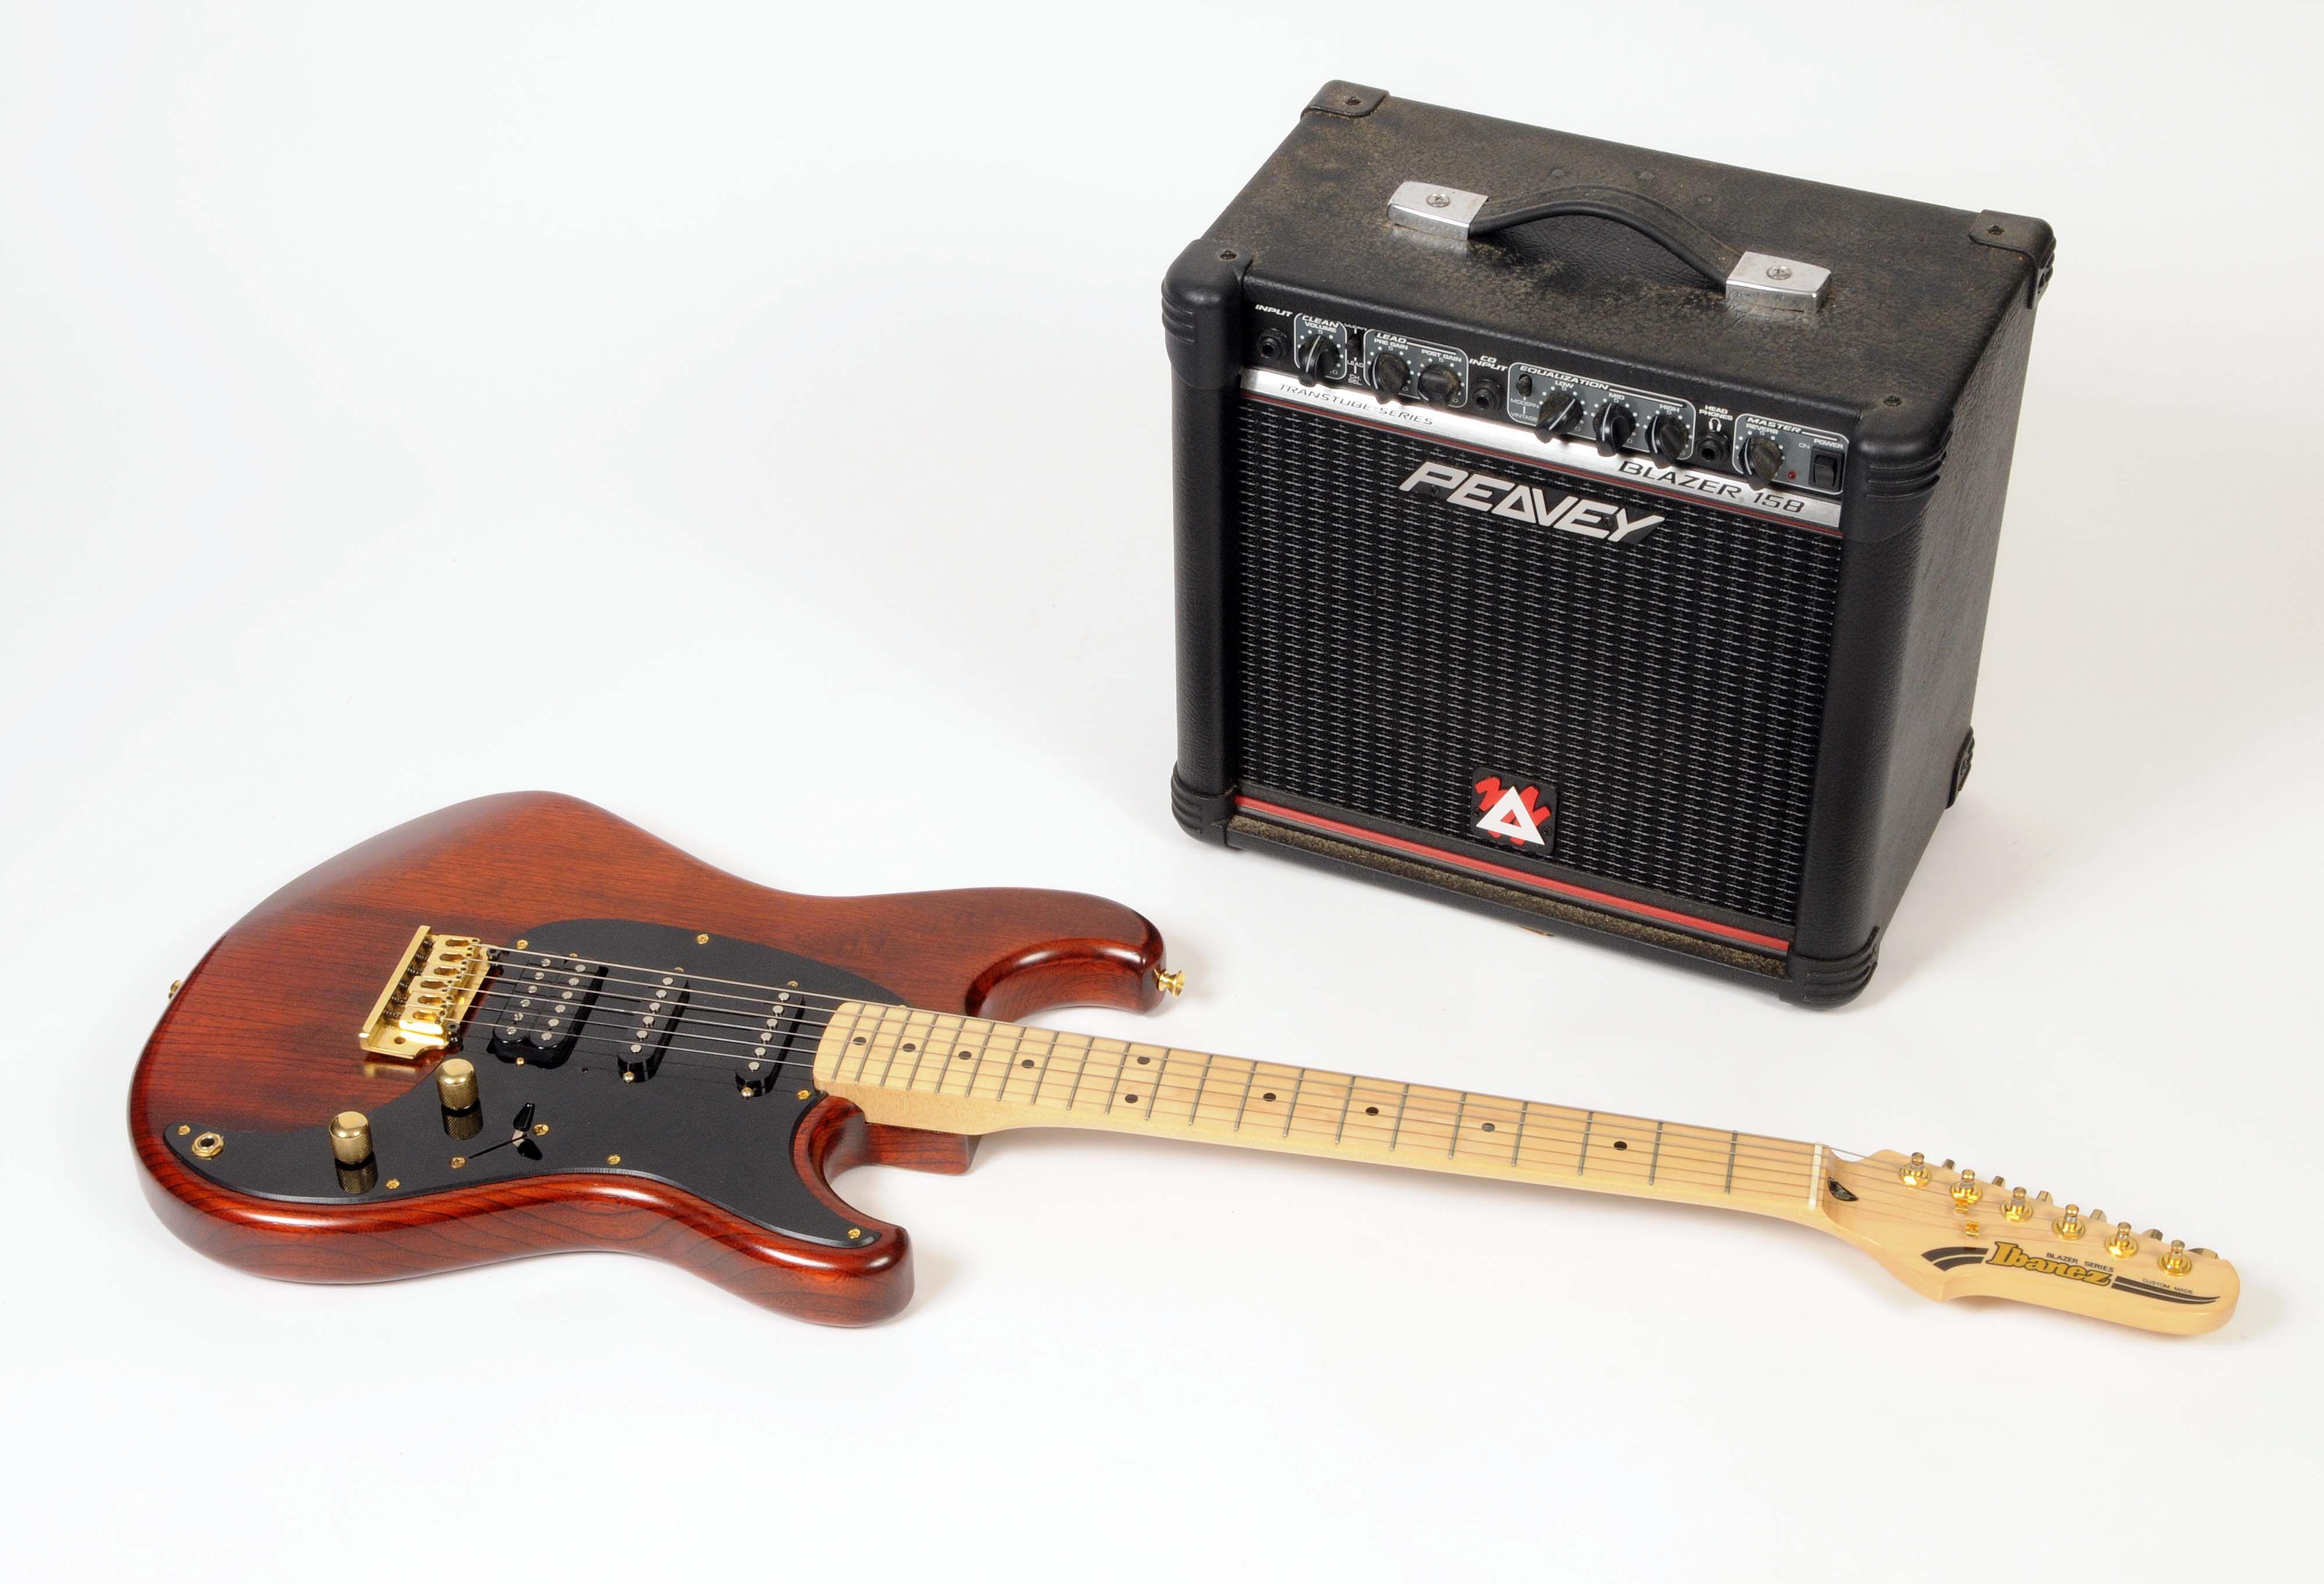 An Ibanez Blazer series custom made electric guitar with wood grain design body bears serial